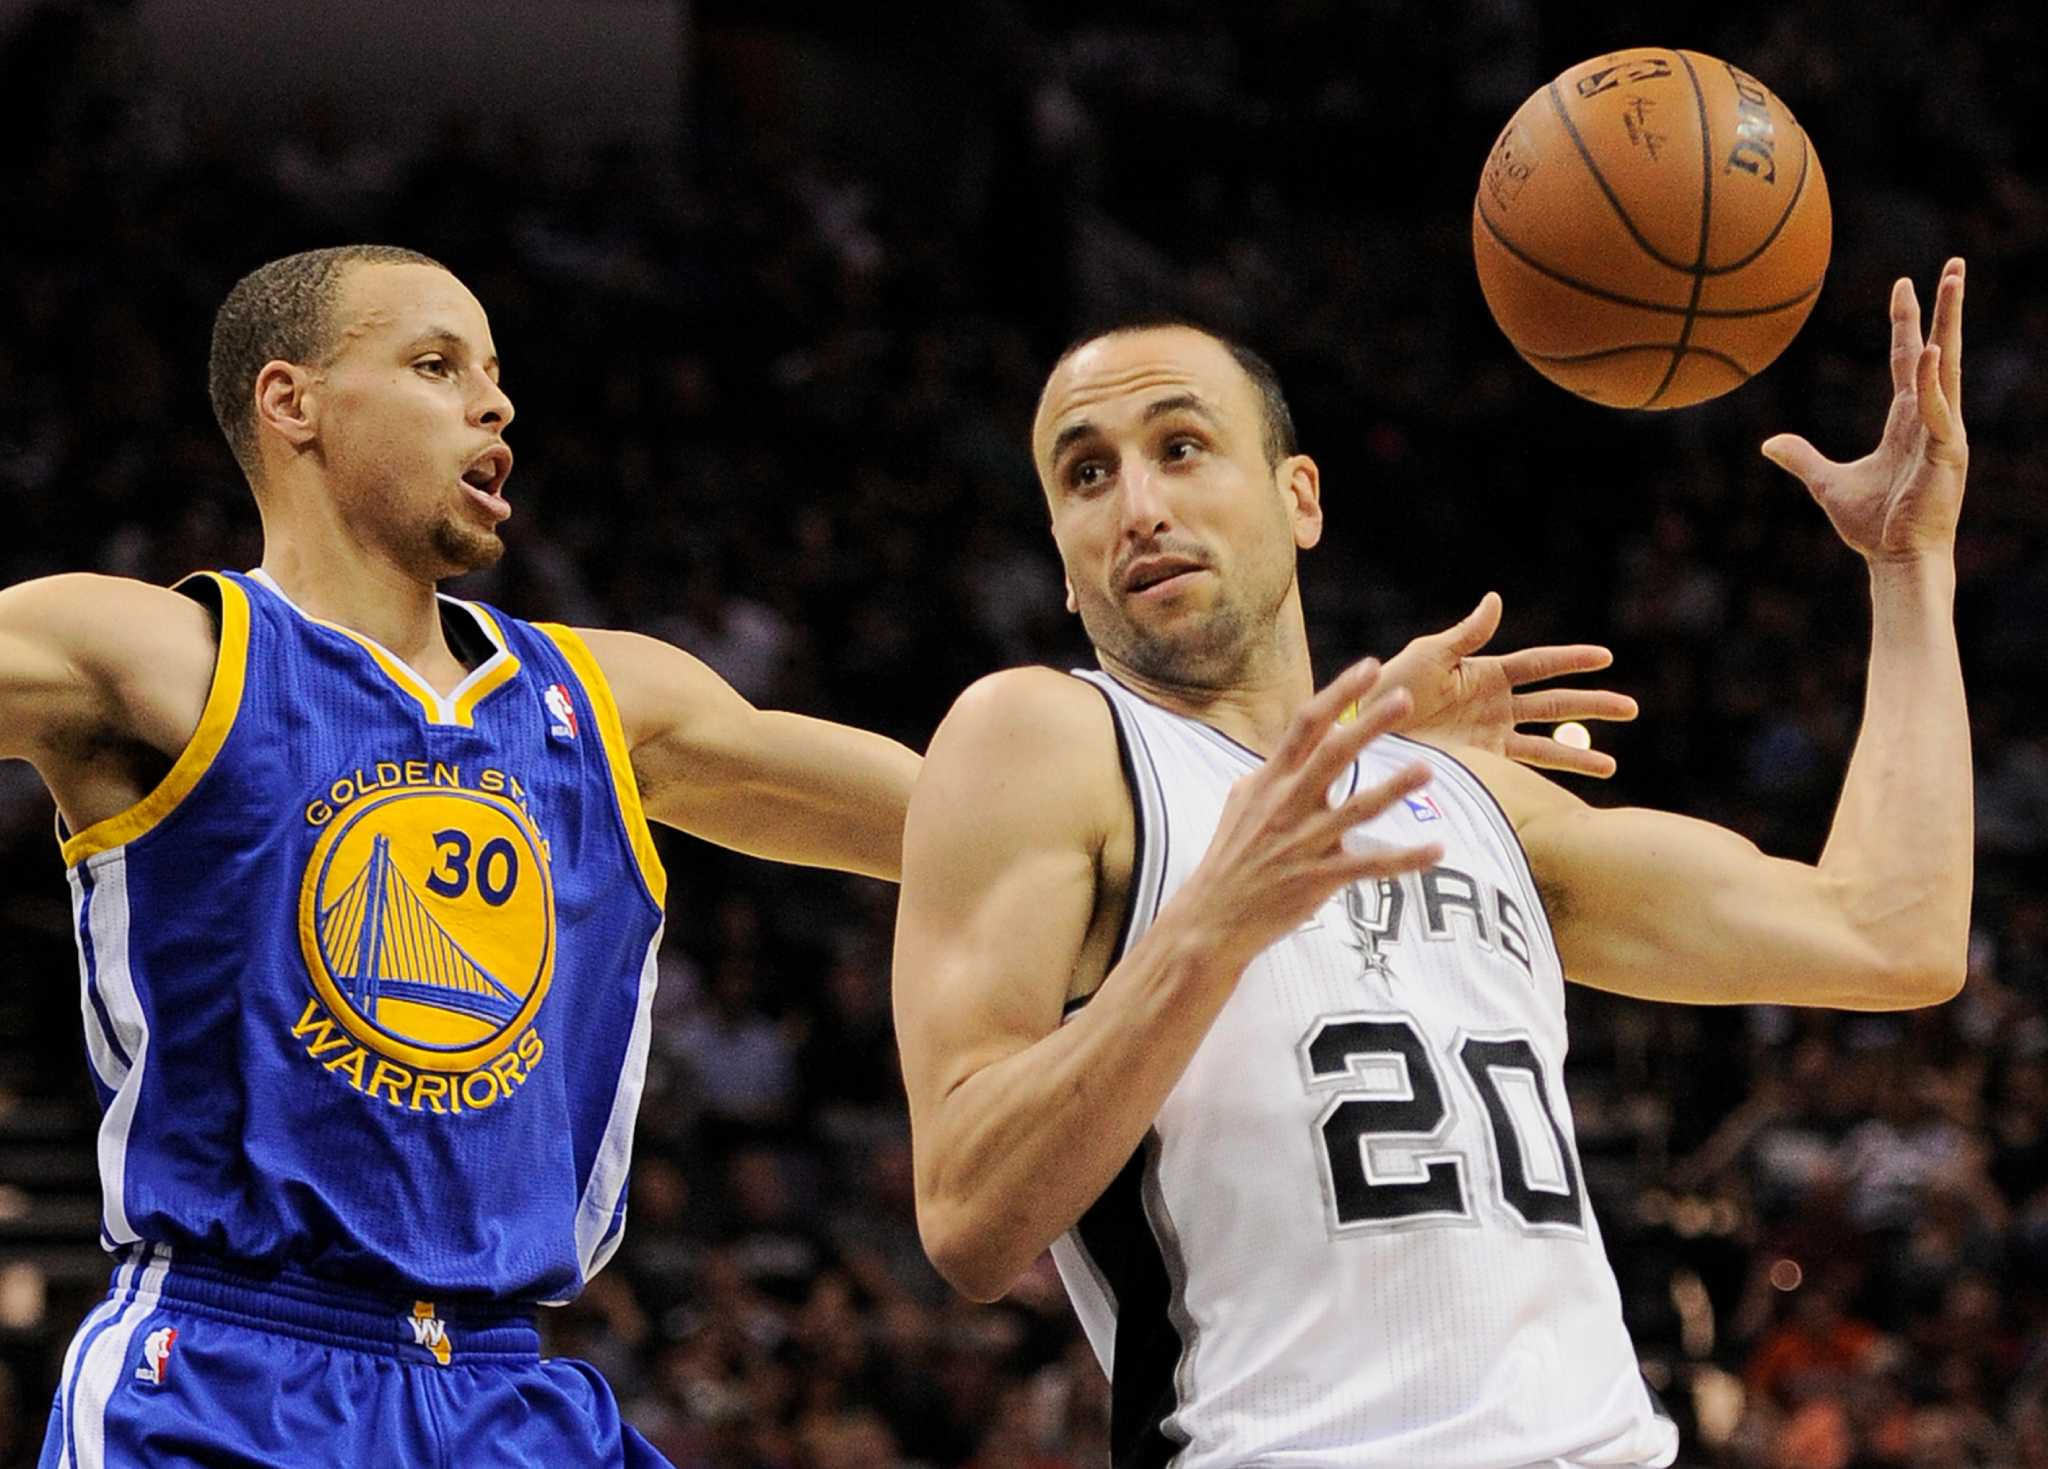 Warriors coach Steve Kerr sees some Manu Ginobili in Steph Curry